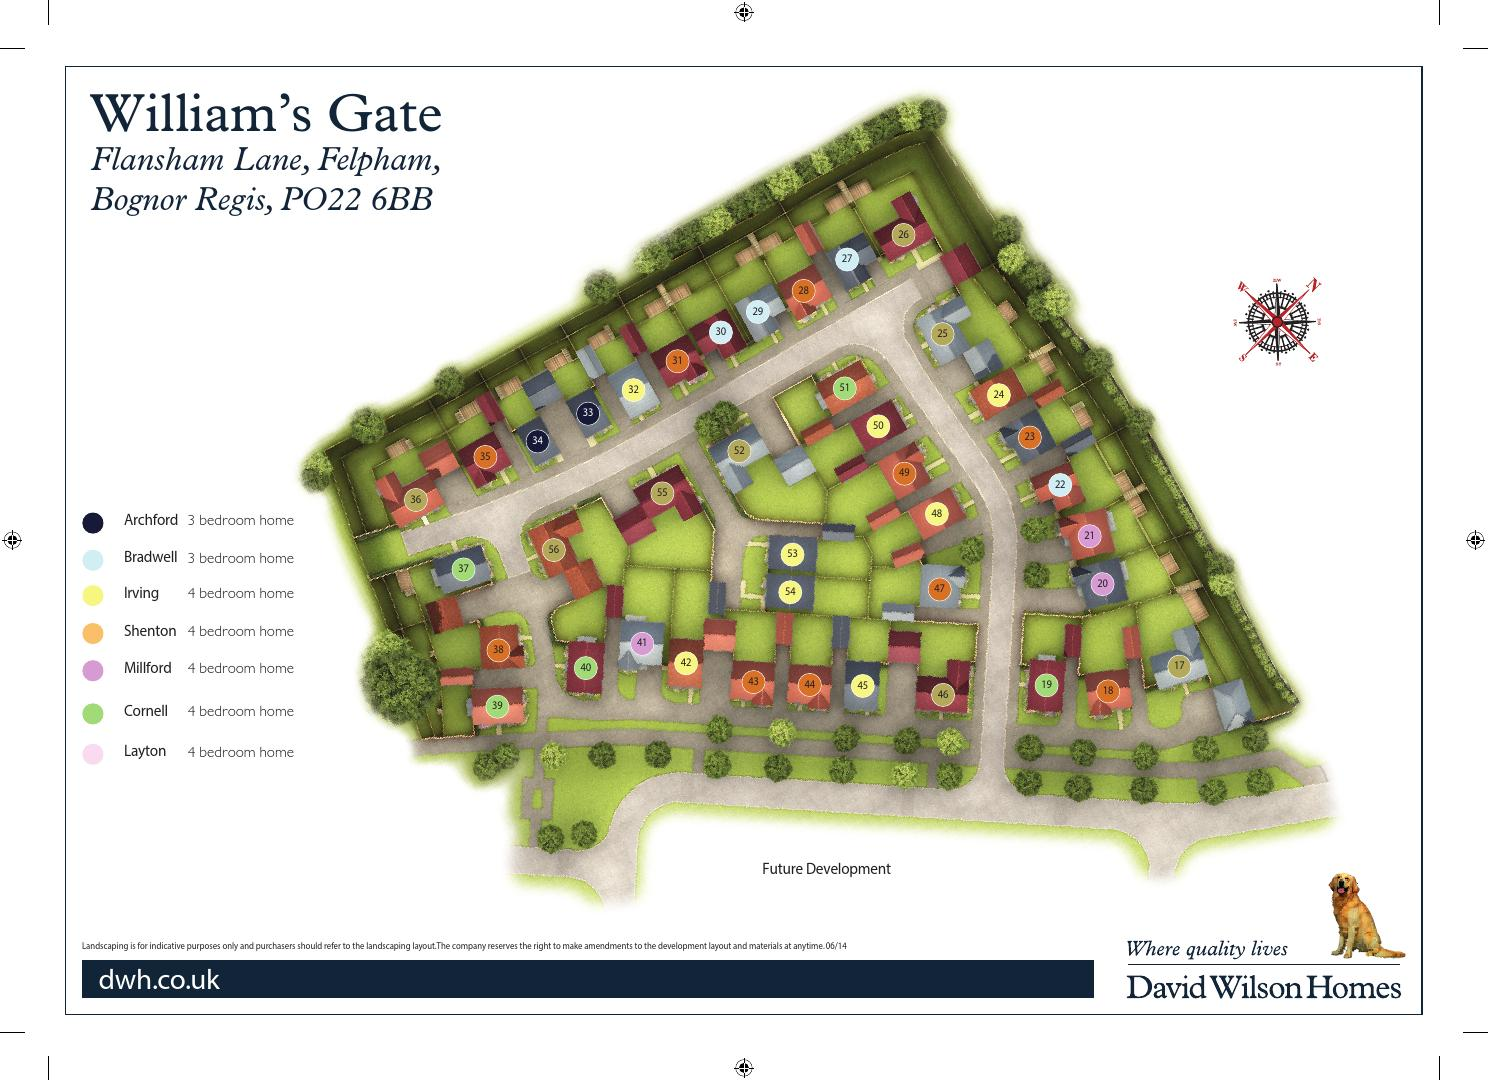 David Wilson Williams Gate By Newhomesforsale Co Uk Issuu